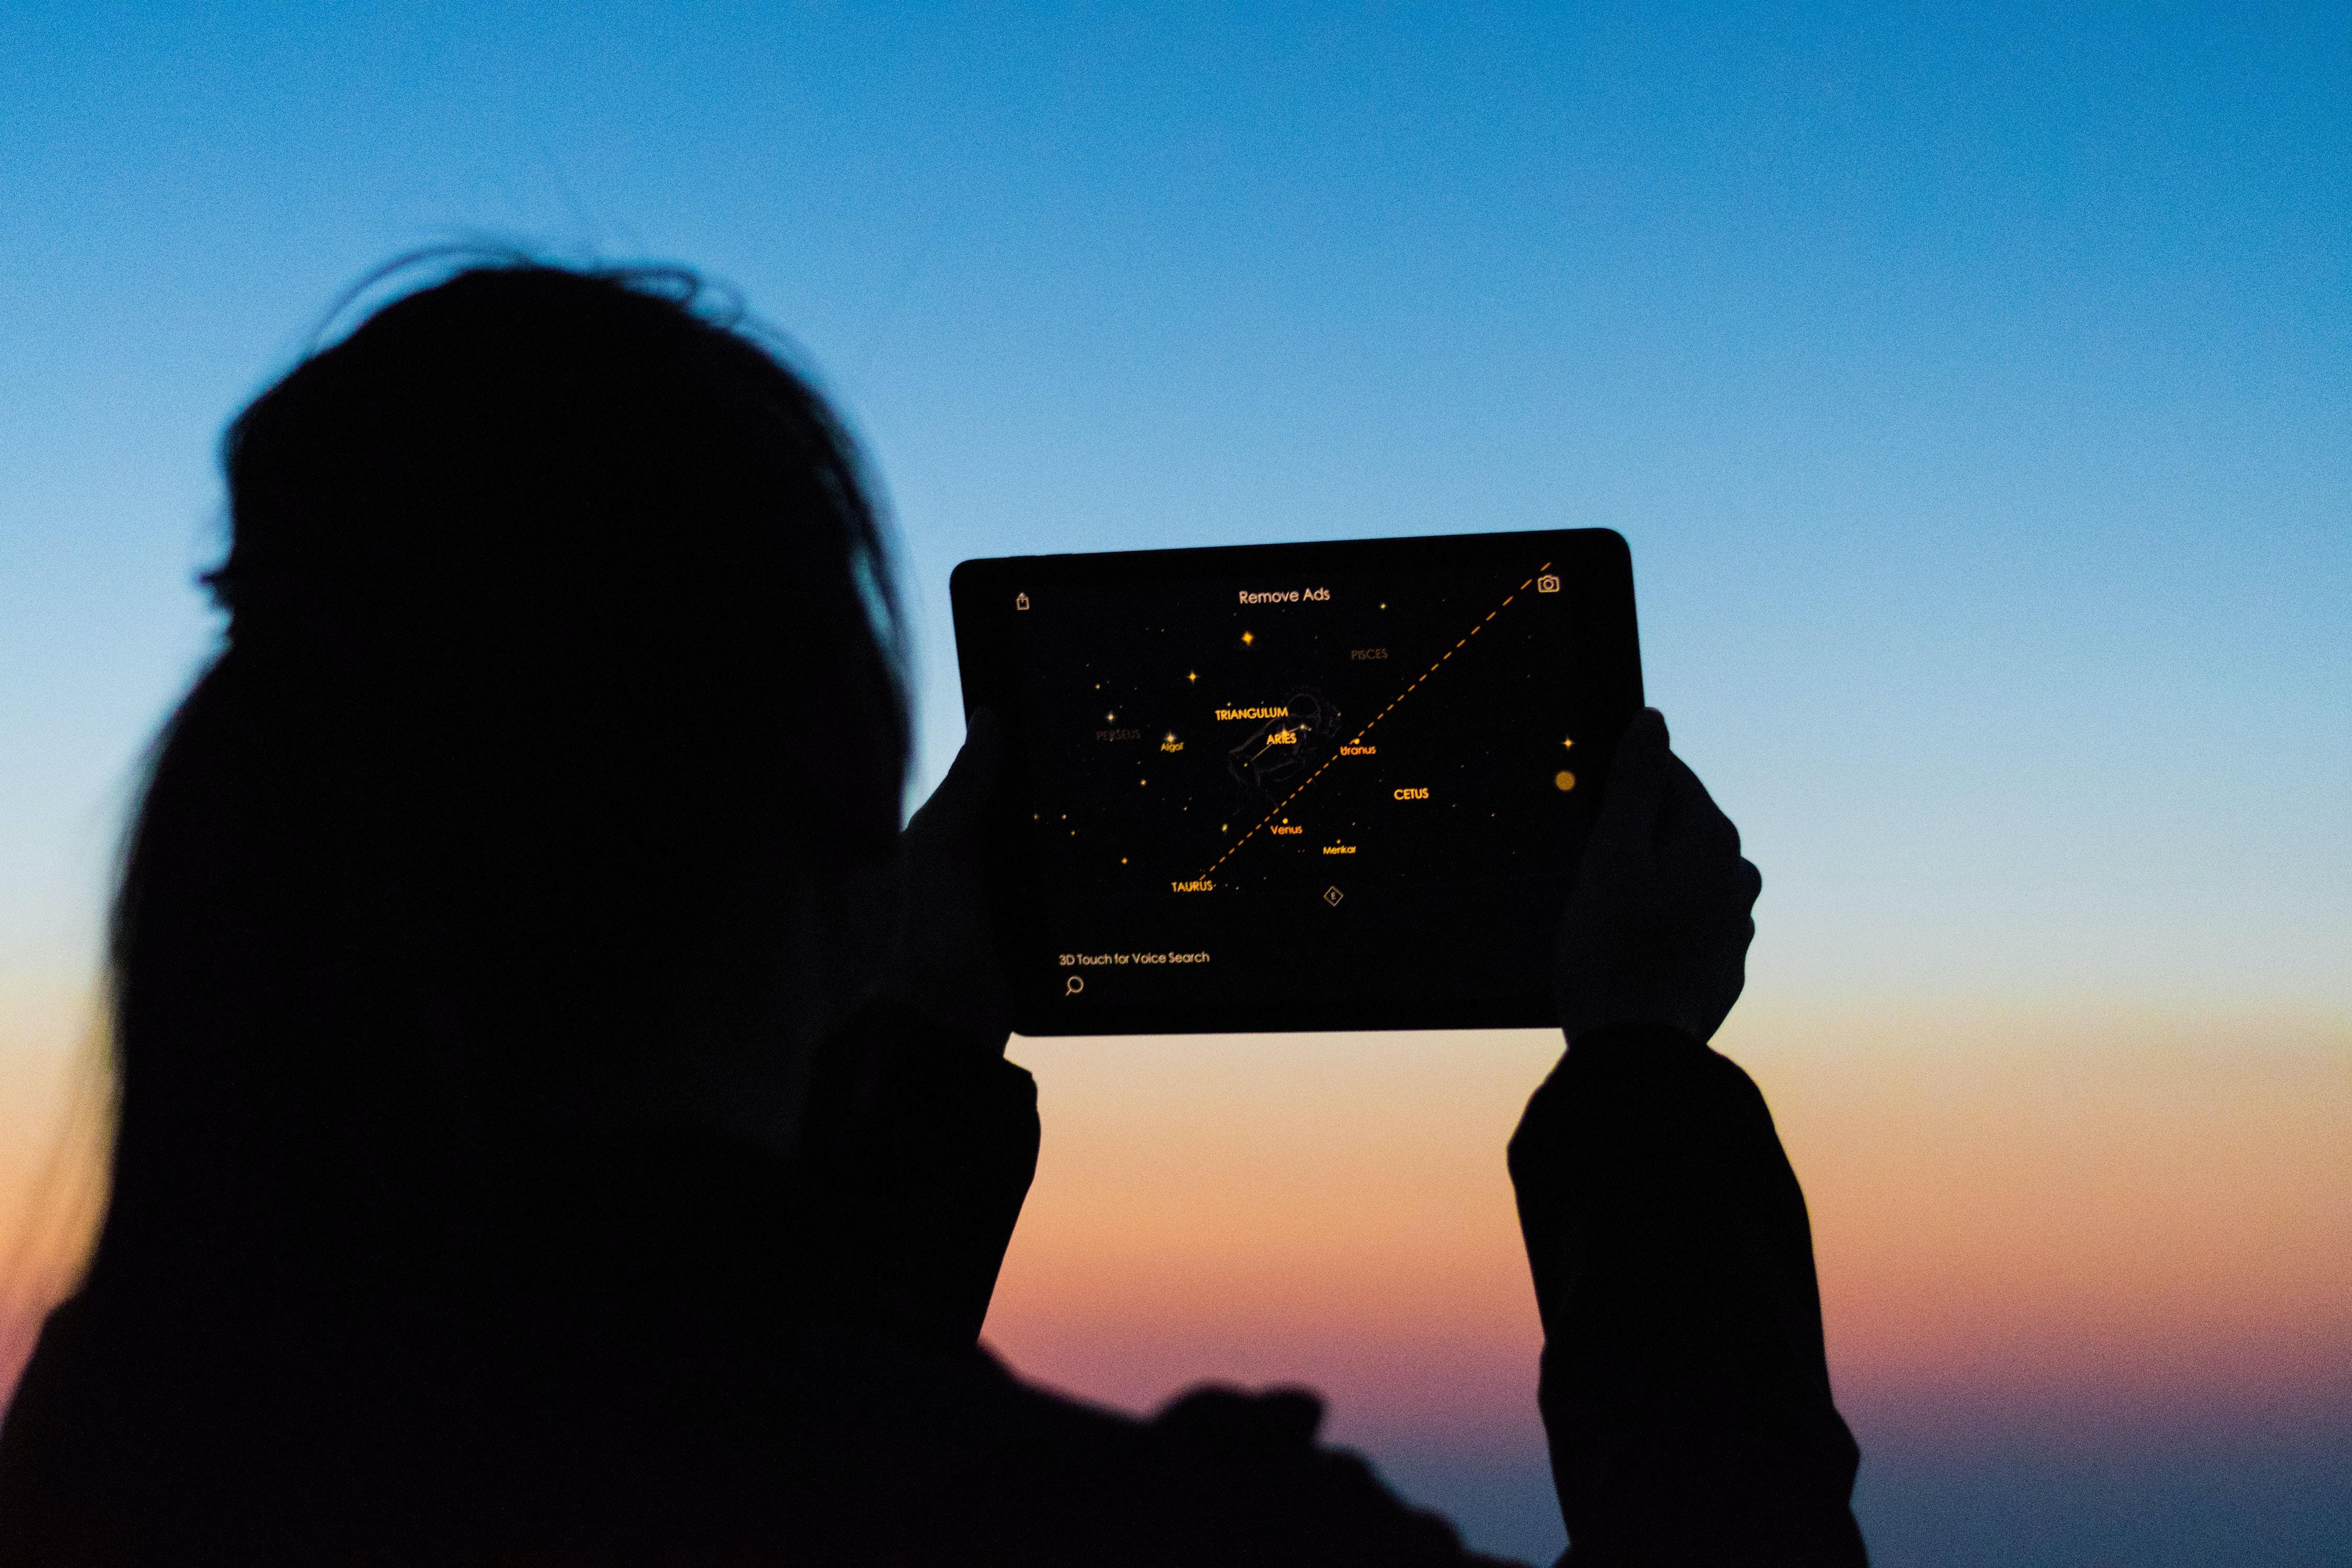 Person using iPad at sunset; image by Leon Liu, via Unsplash.com.